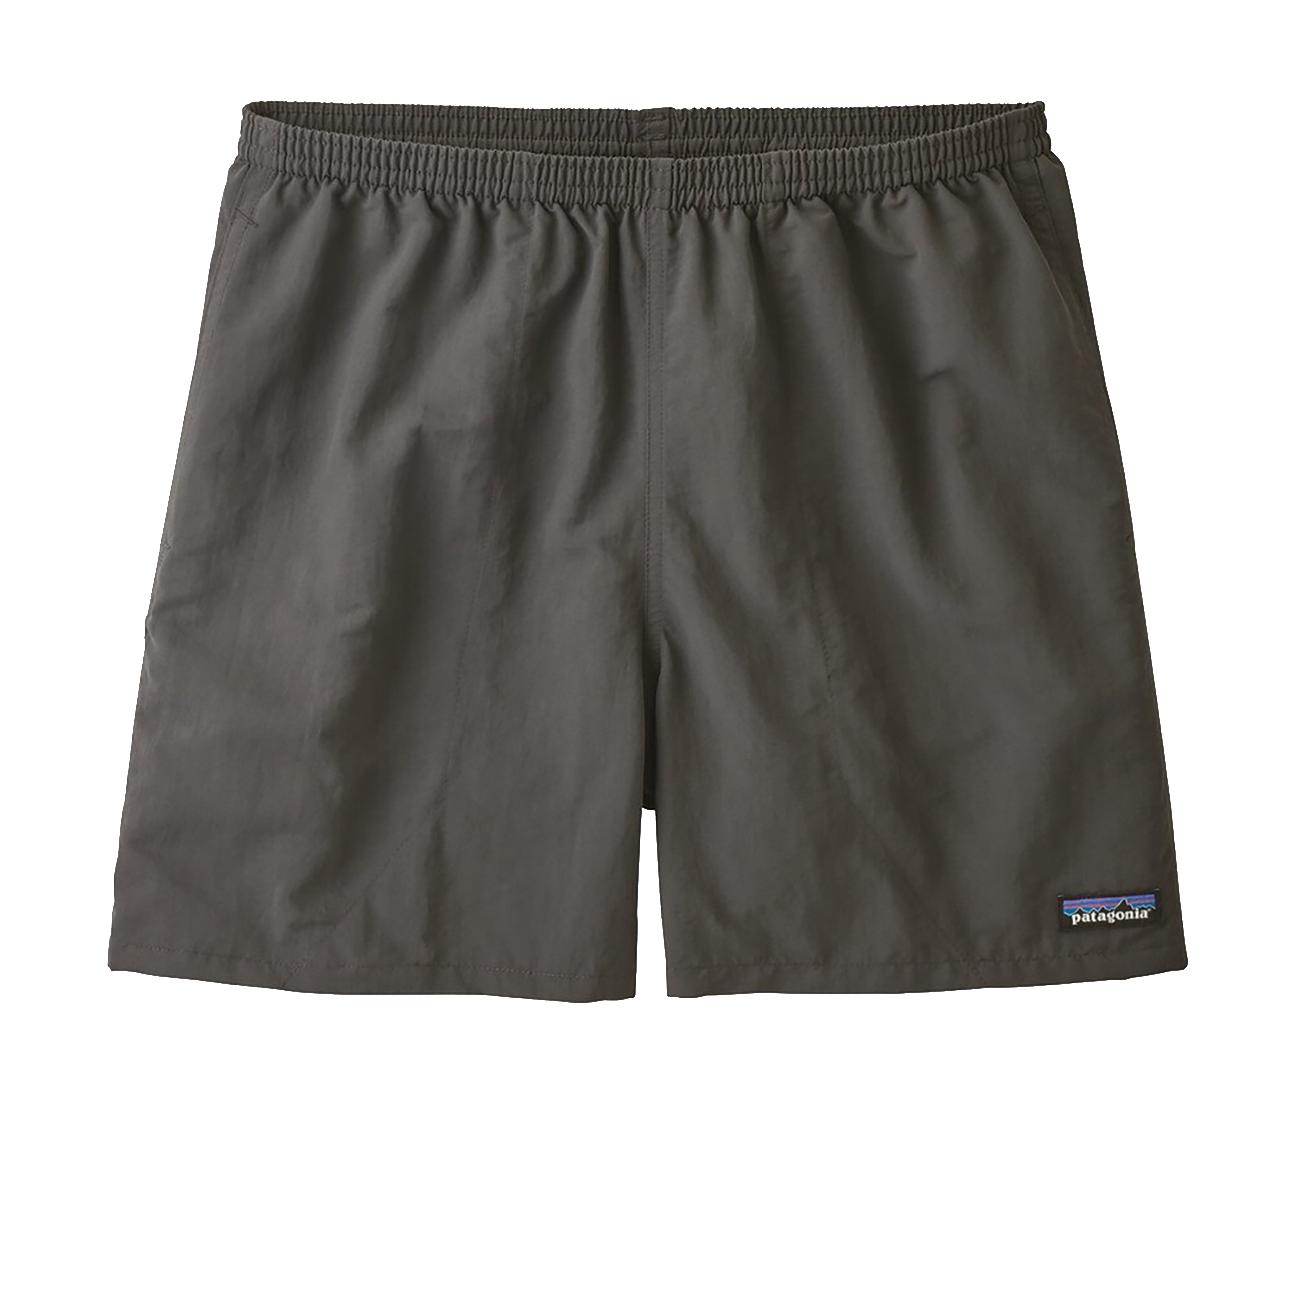 "Men's Baggies Shorts -5"", Forge Grey-1"